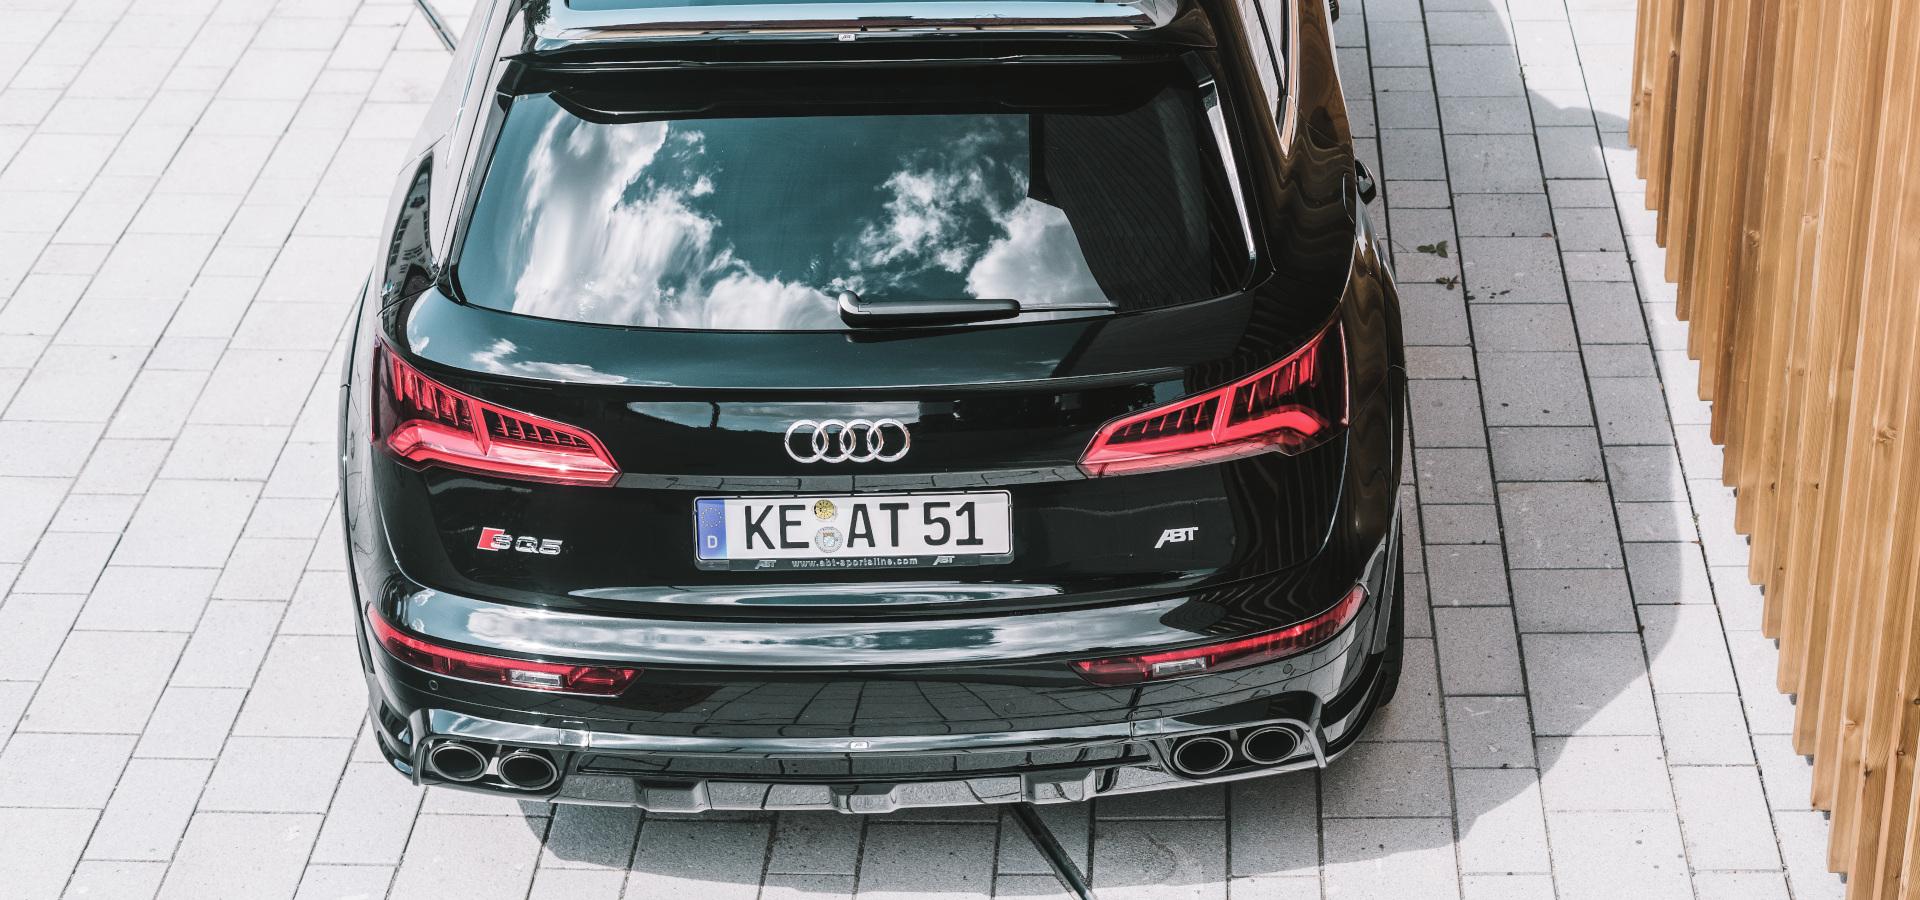 Audi Q5 0 60 >> Audi Q5 0 60 Upcoming New Car Release 2020